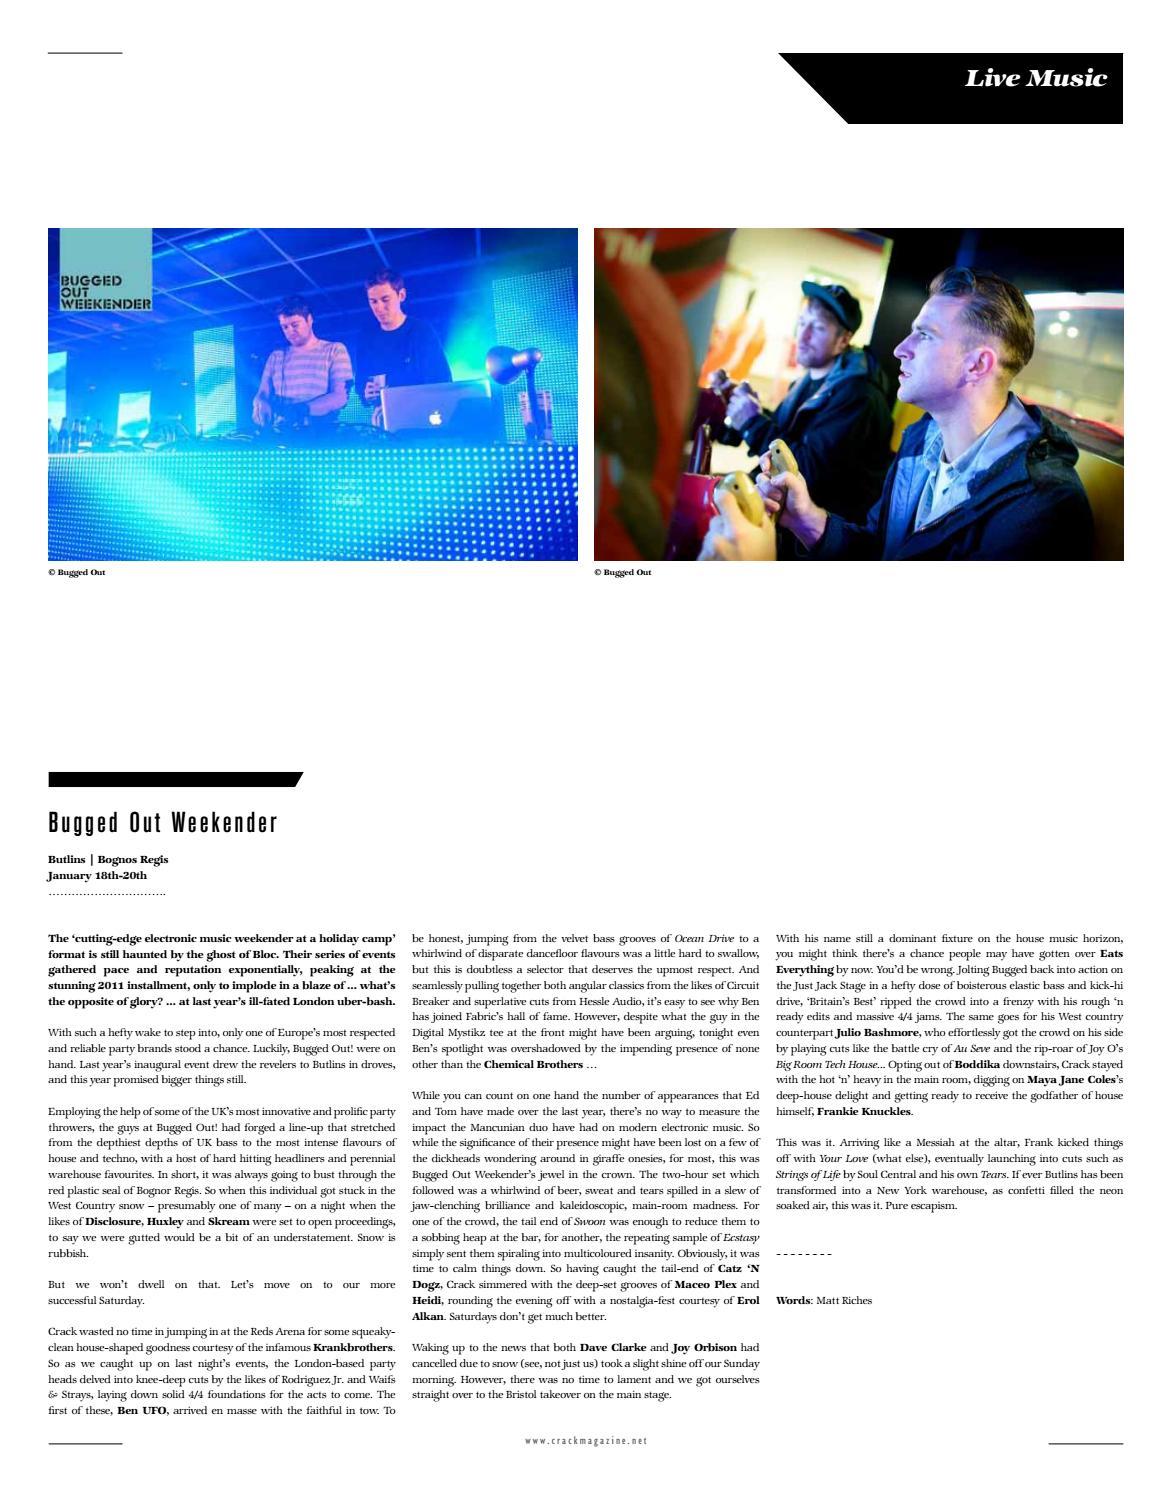 CRACK Issue 27 by Crack Magazine - issuu